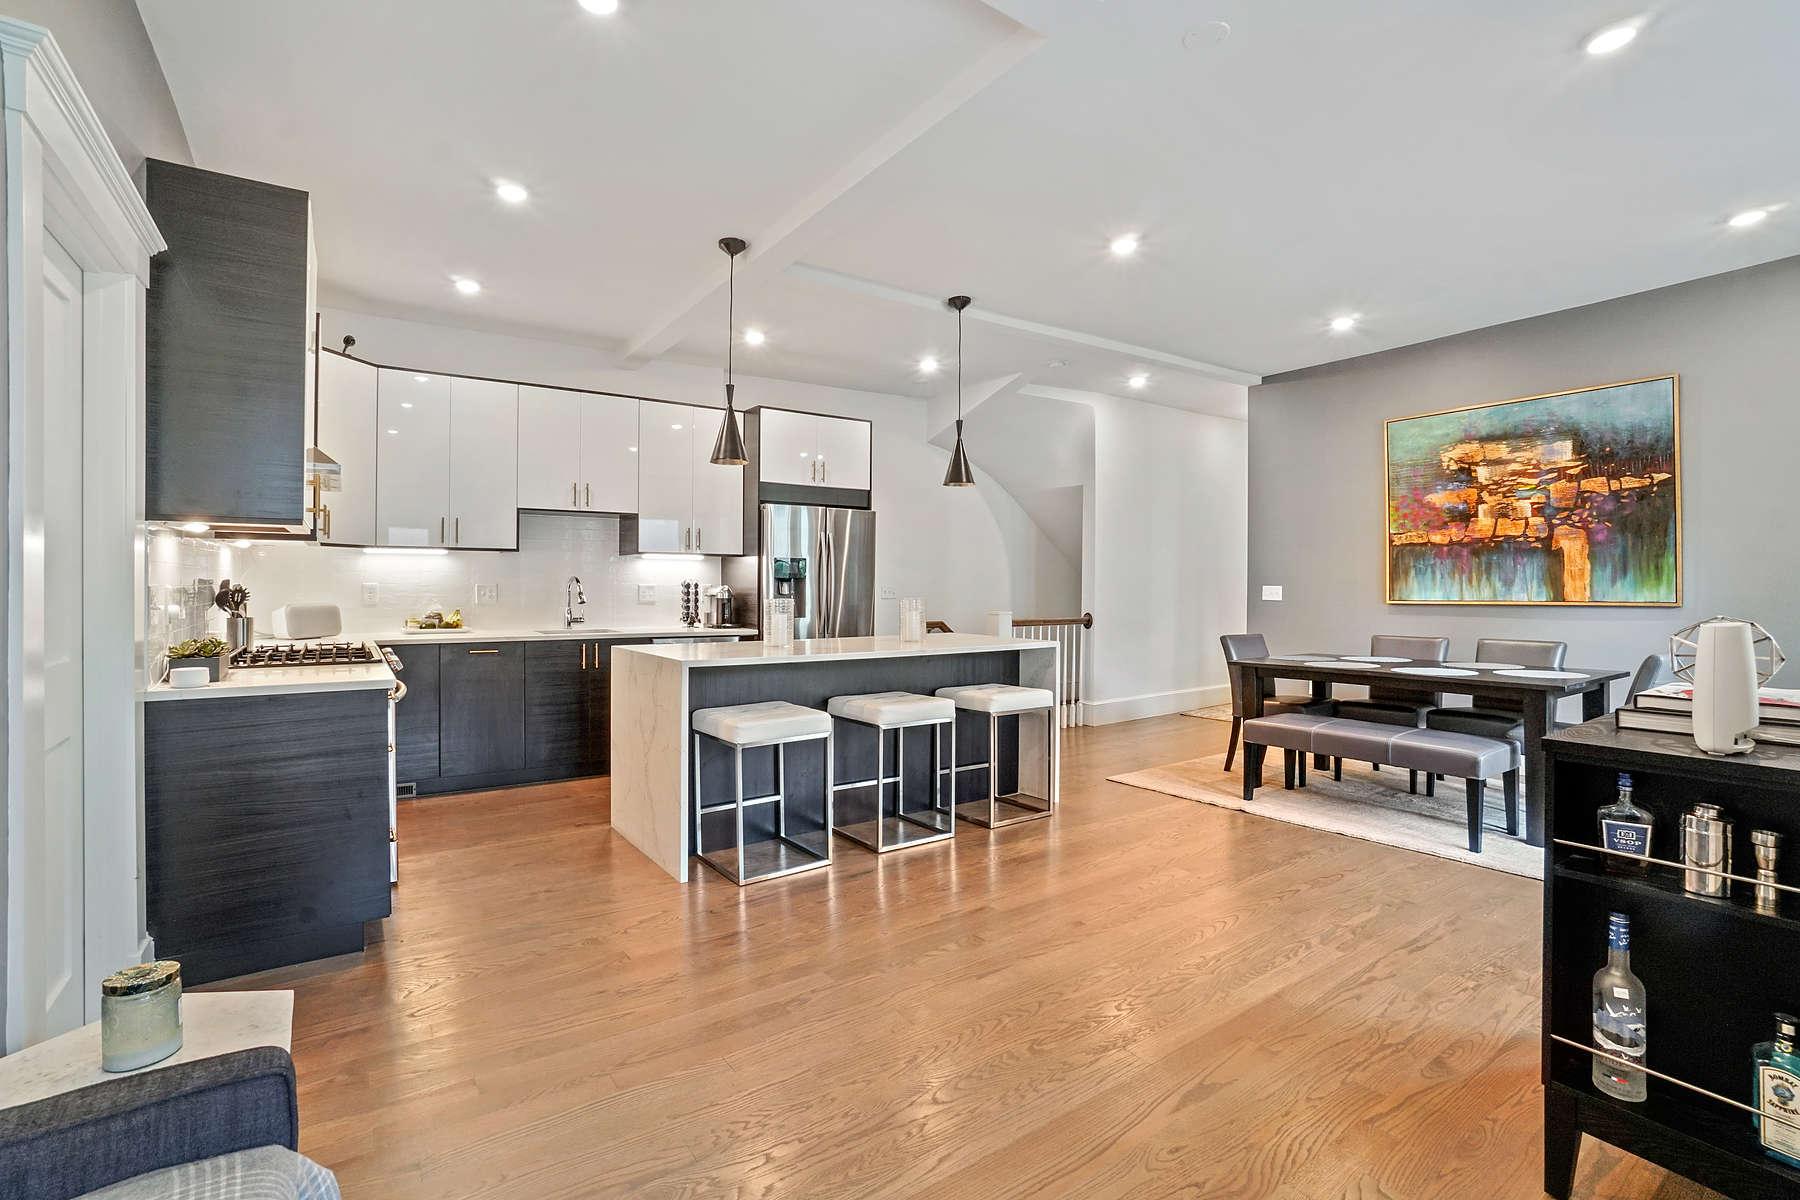 Condominiums 용 매매 에 20 Lincoln Street, Unit 1 20 Lincoln Street - Unit 1, Somerville, 매사추세츠 02145 미국